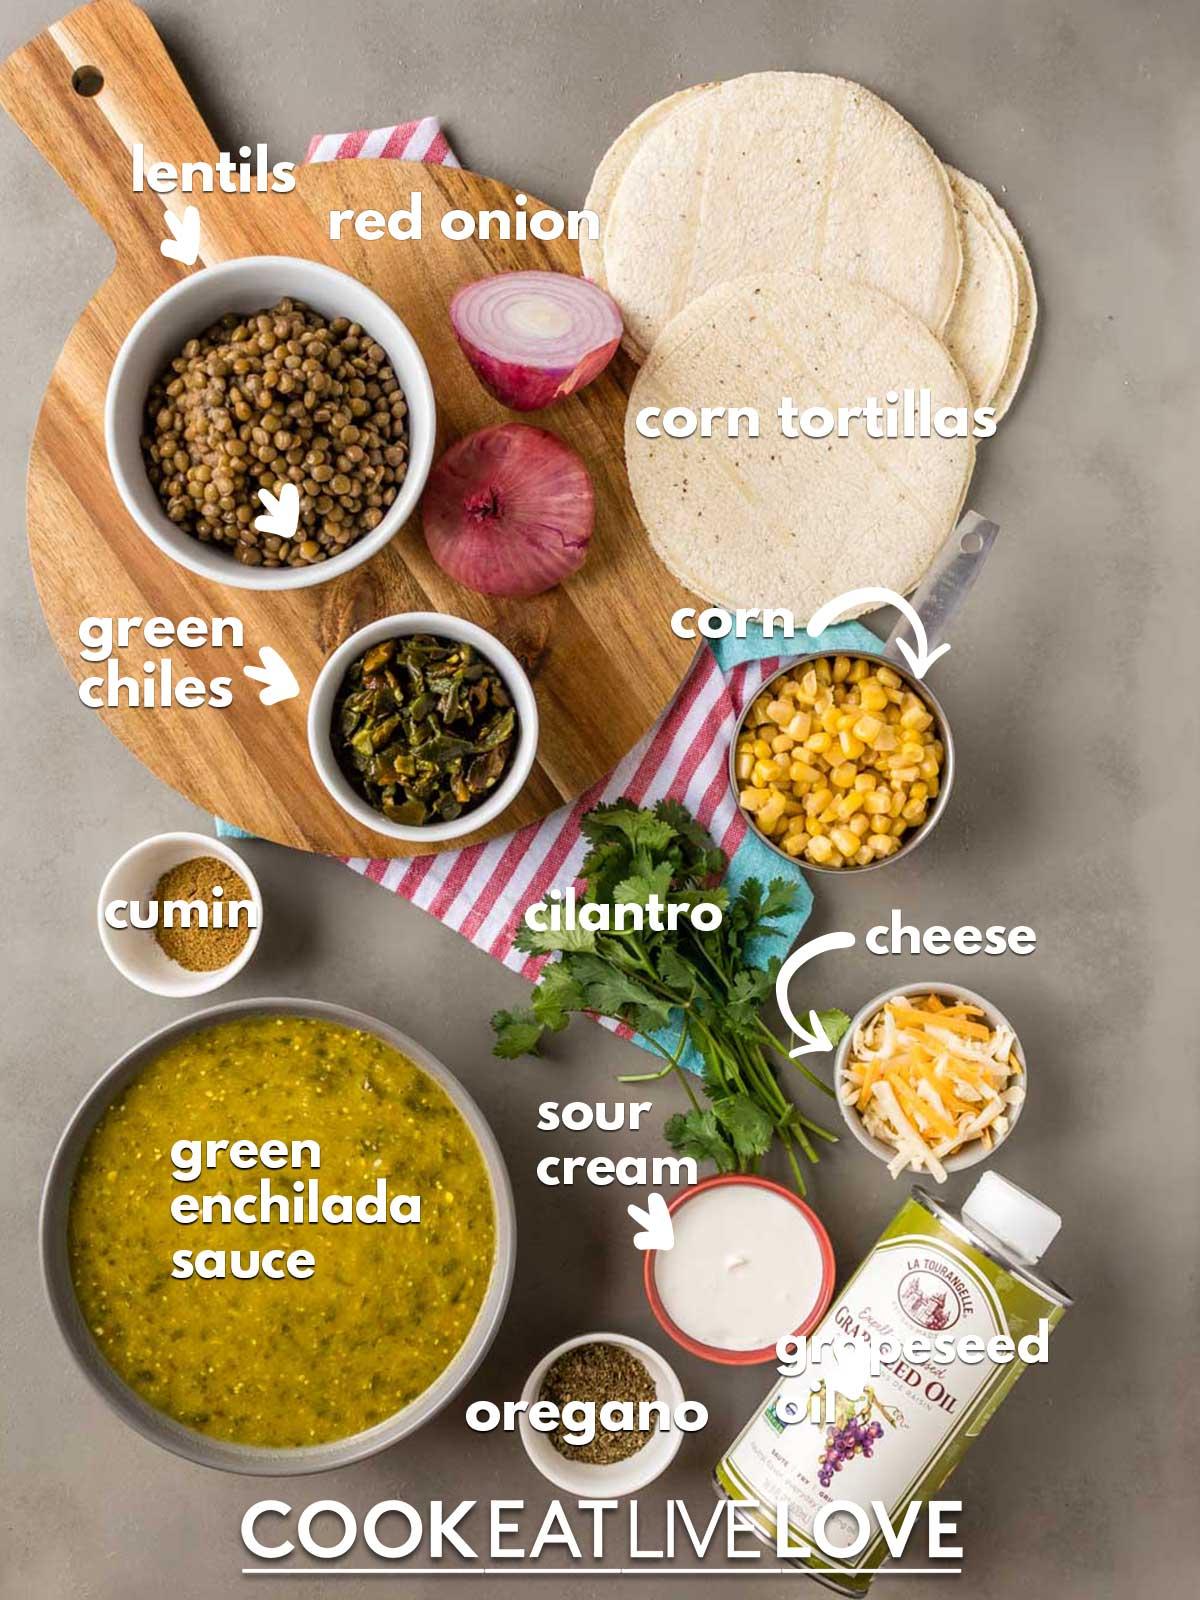 Ingredients to make vegetarian green enchiladas on the table